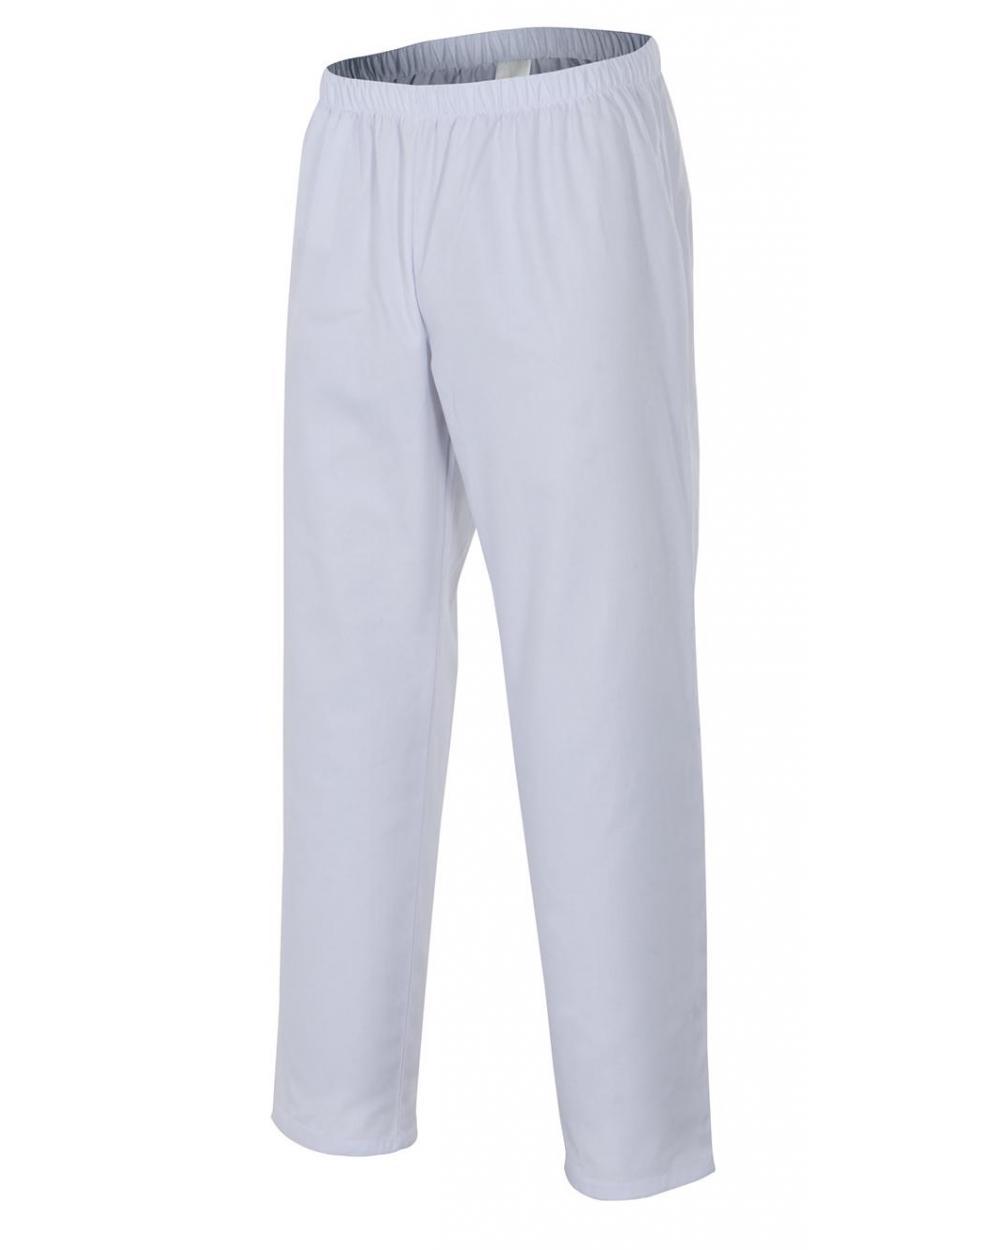 Comprar Pantalón pijama industria alimentaria serie 253001 online barato Blanco